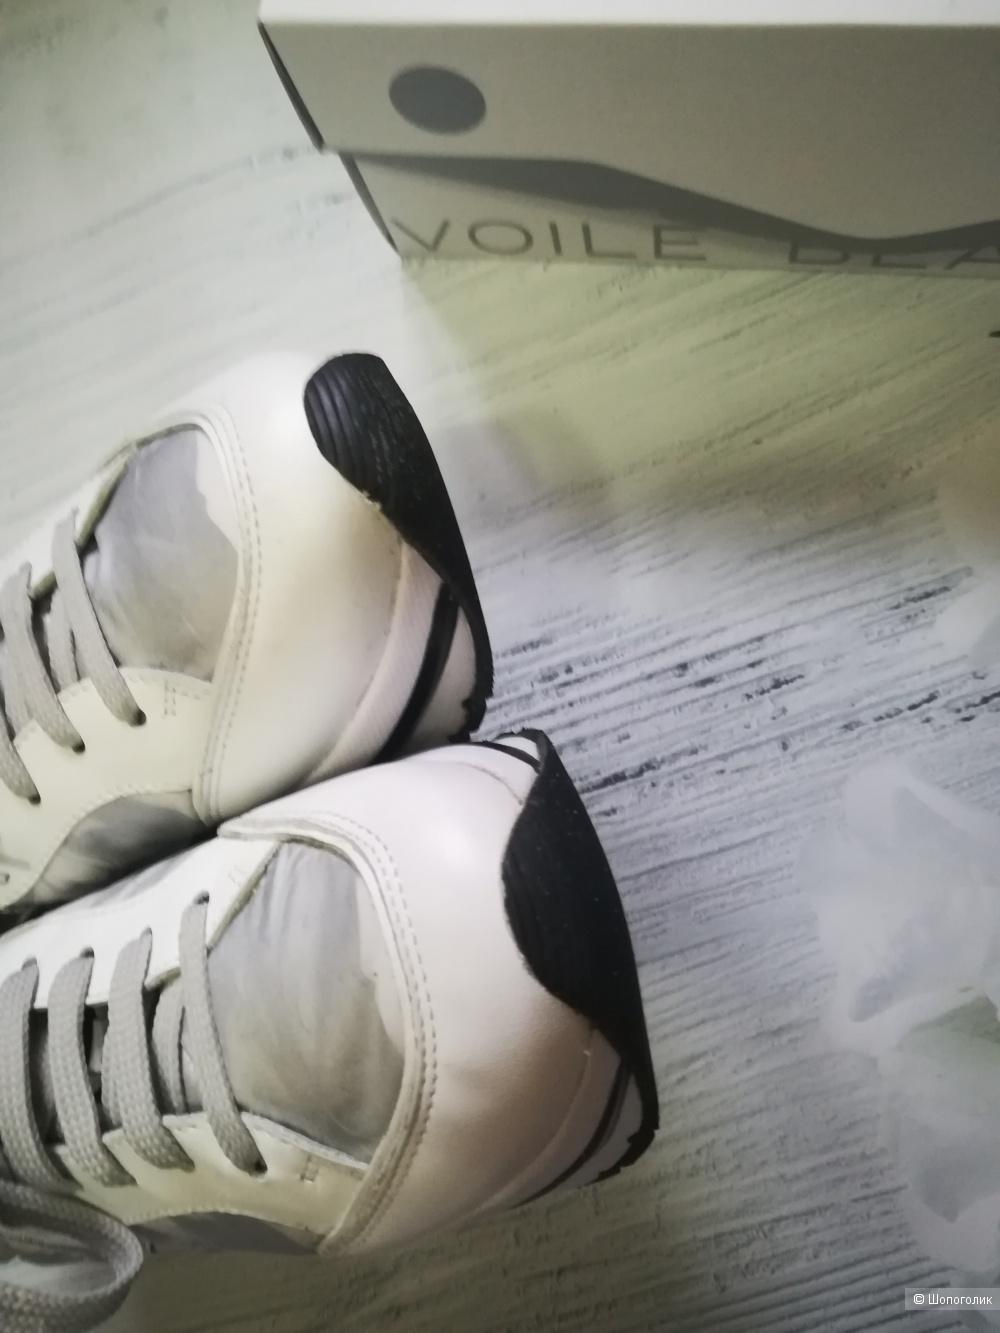 Кроссовки Voile blanche,37